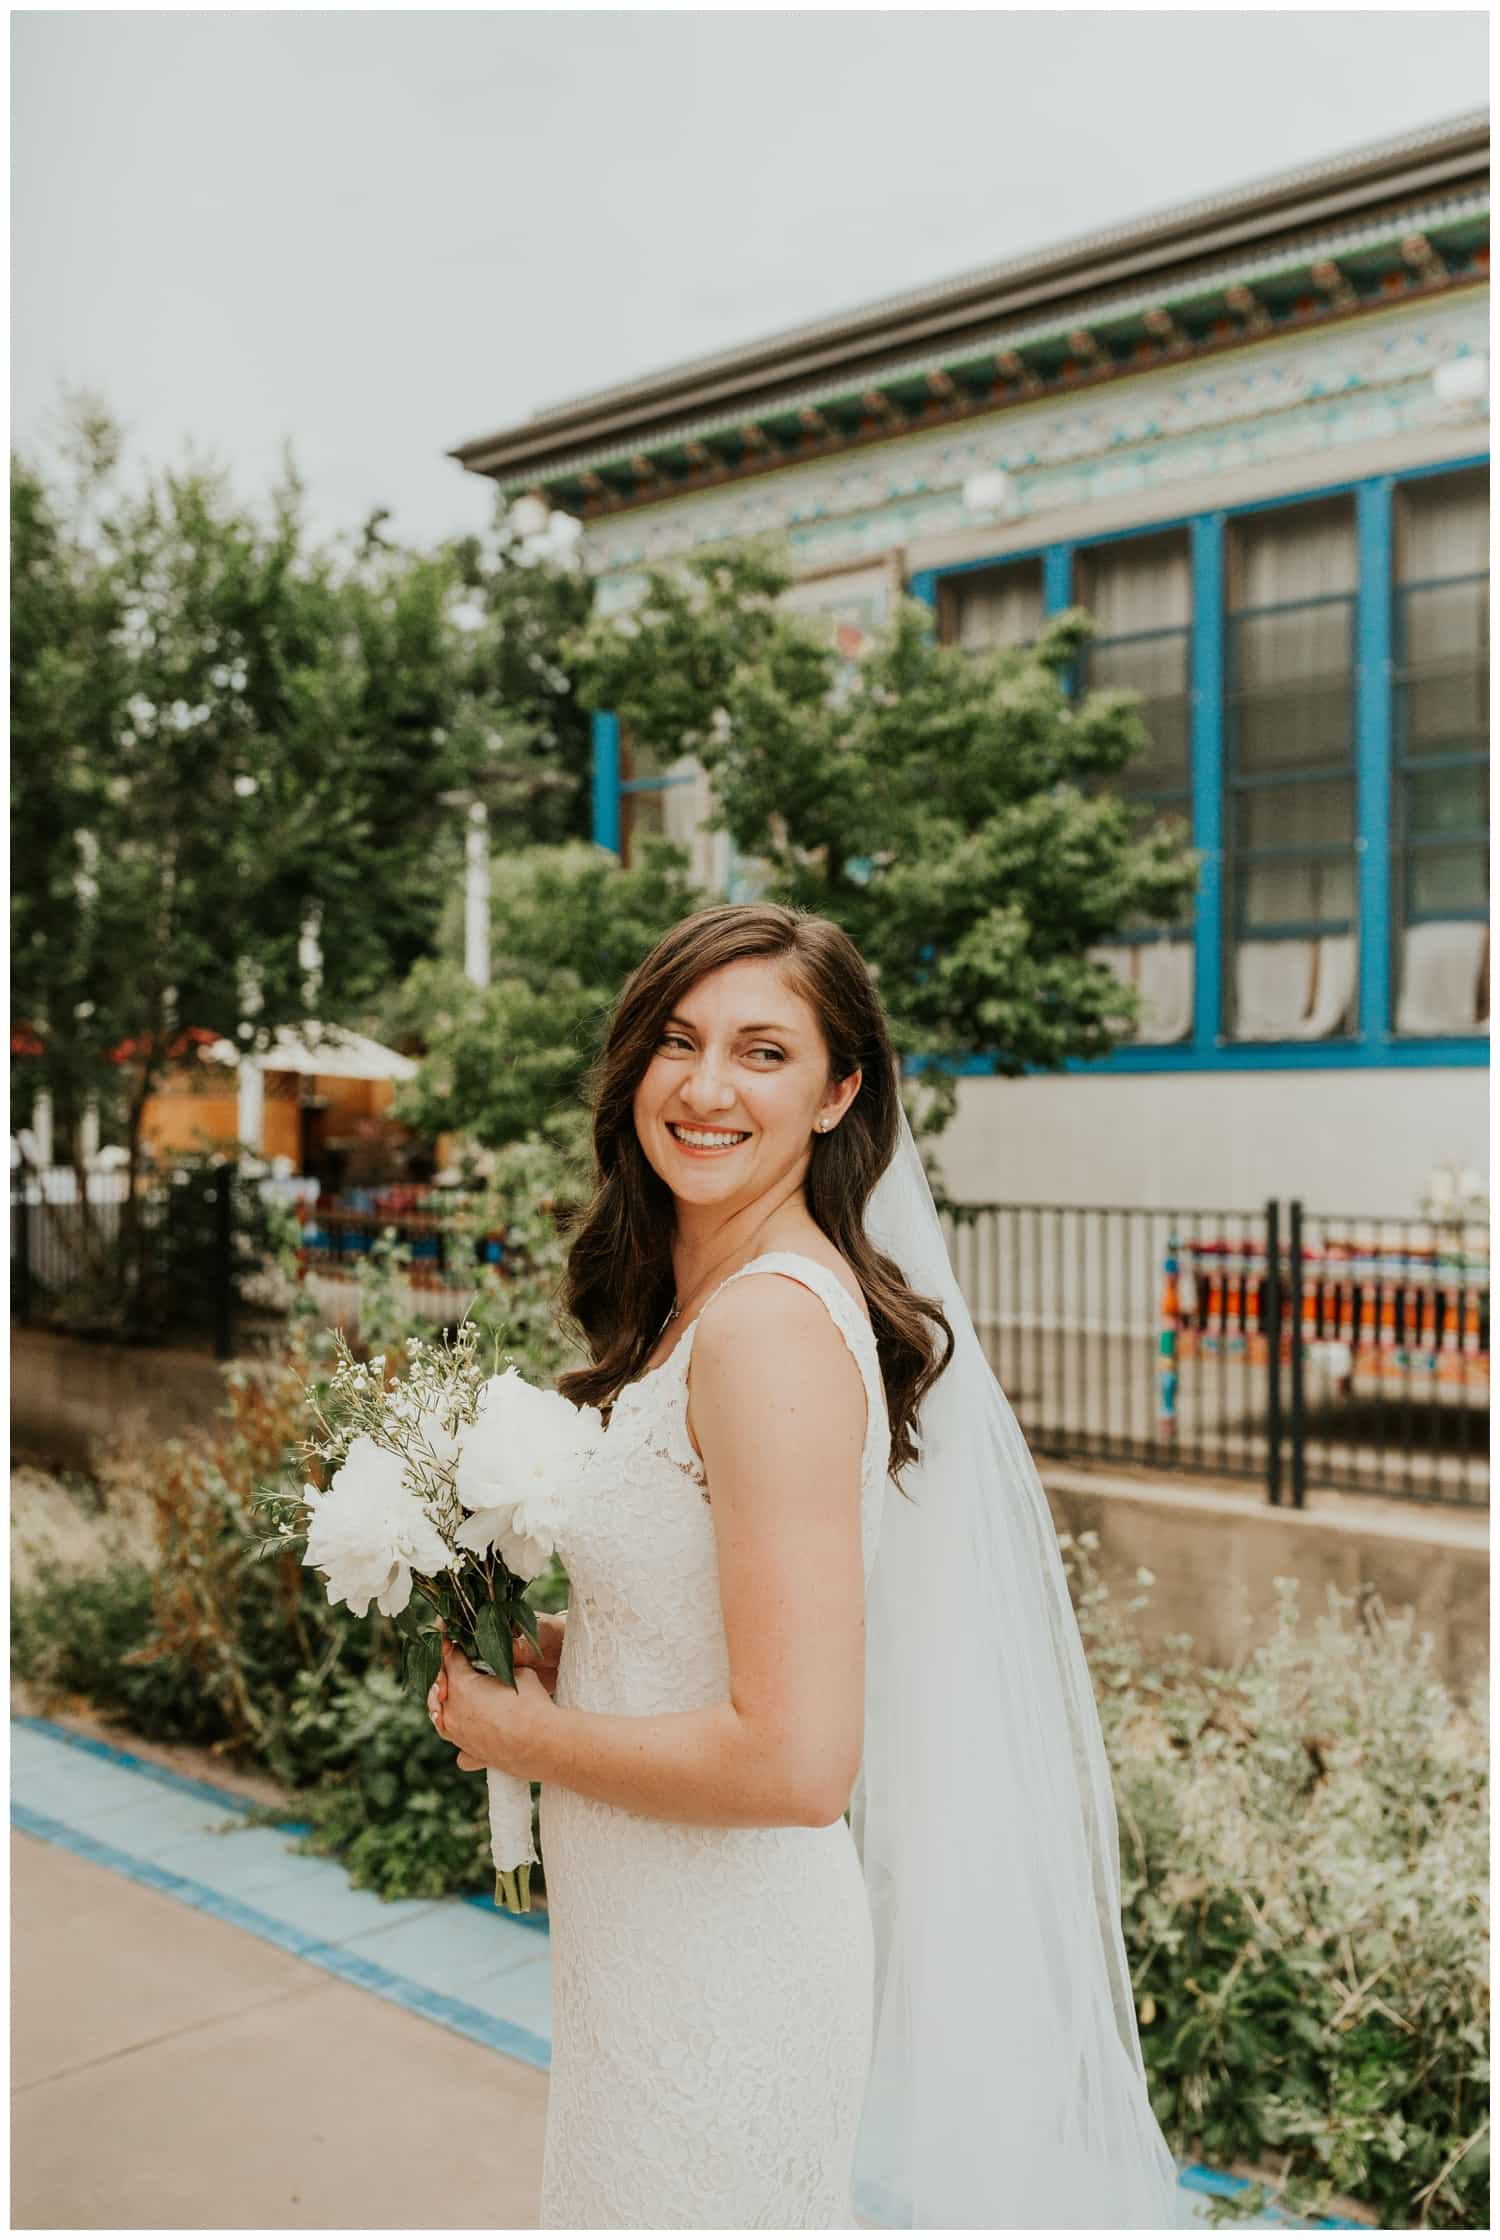 SosiCraig-DushanbeTeaHouse-Wedding_0011.jpg